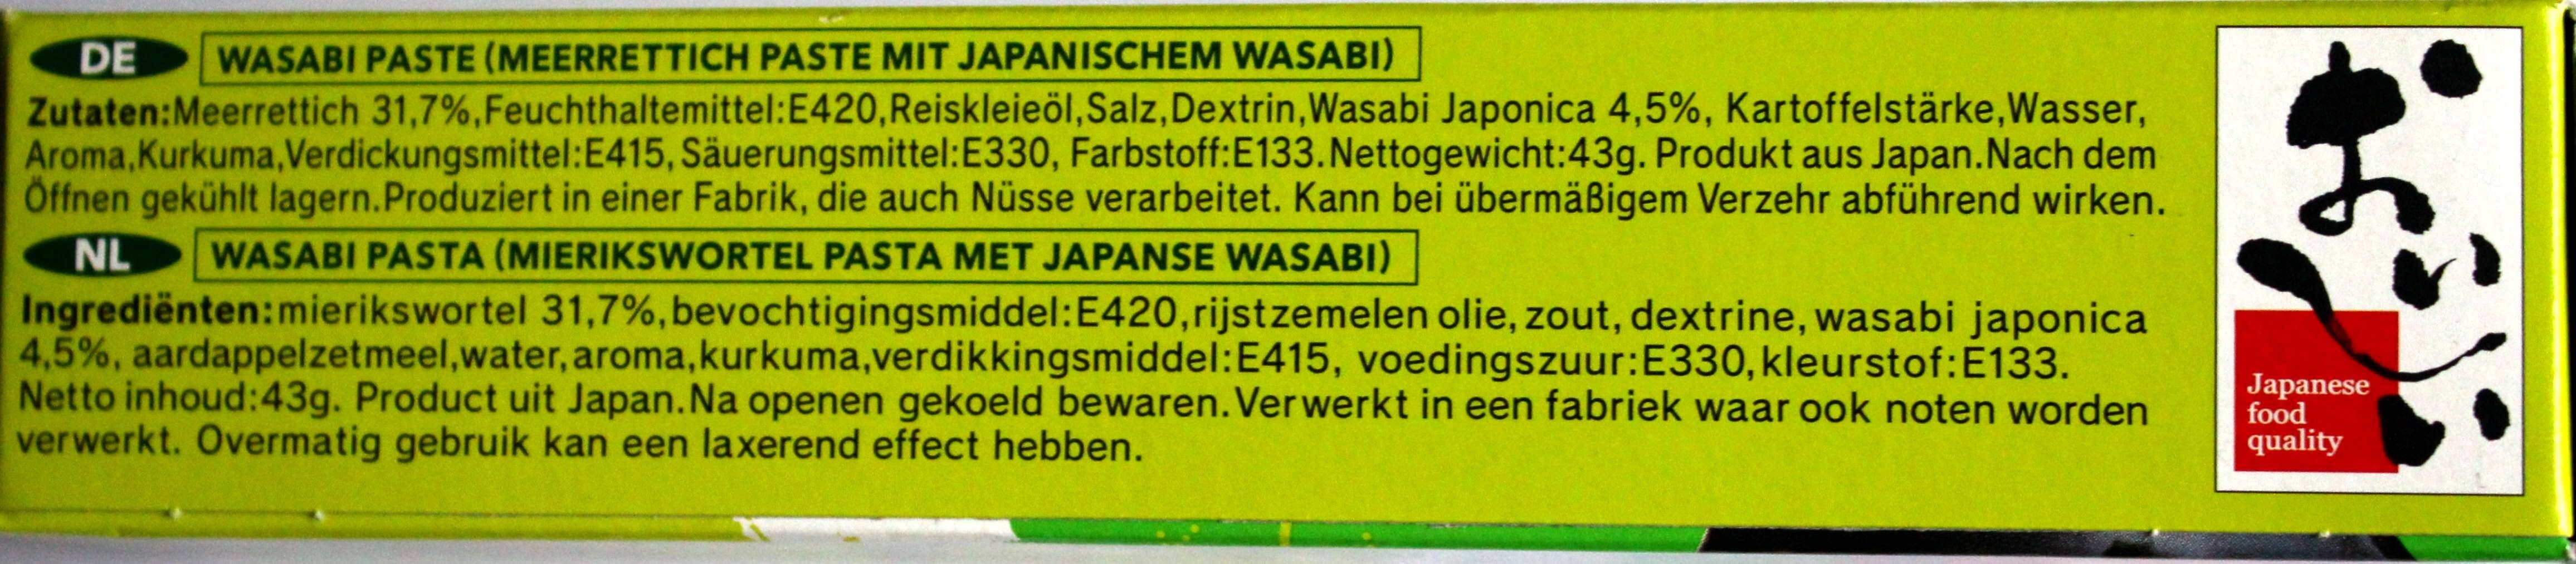 Pâte de Wasabi - Zutaten - de